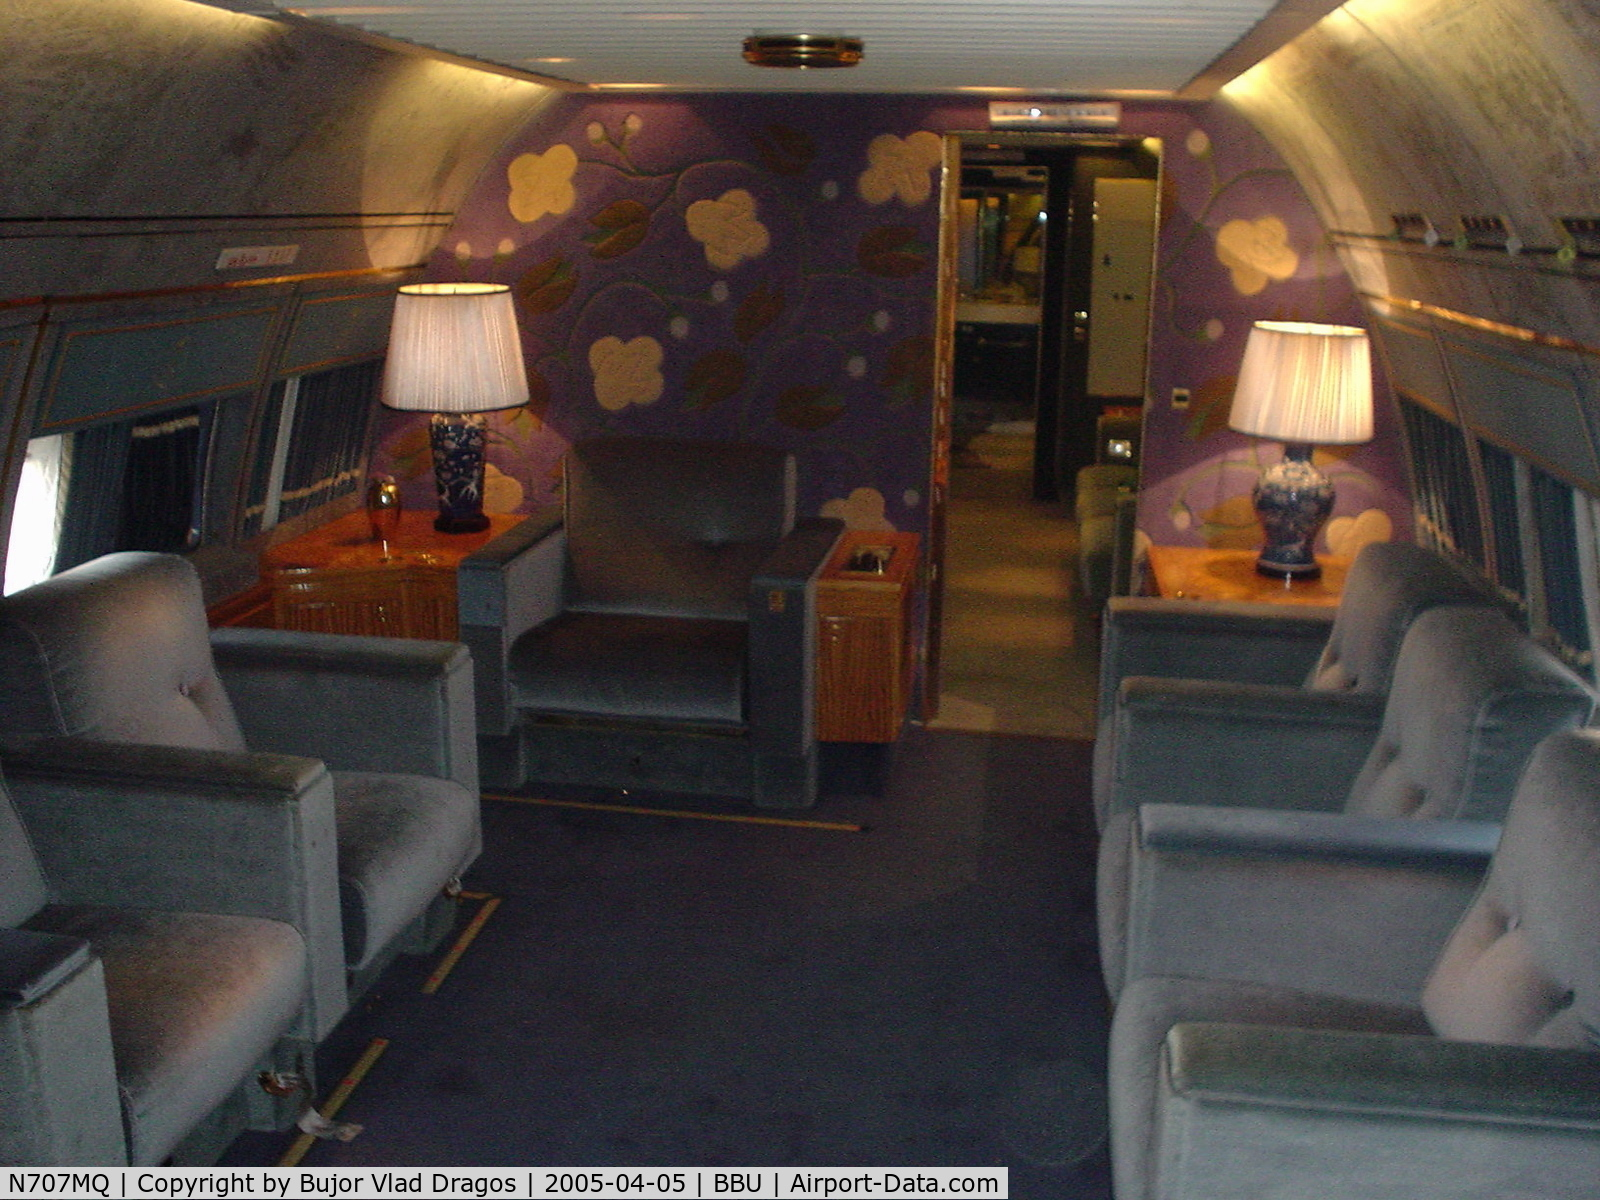 N707MQ, 1977 Boeing 707-368C C/N 21368, Photos taken inside N707MQ VIP ex Royal Saudi Fleet